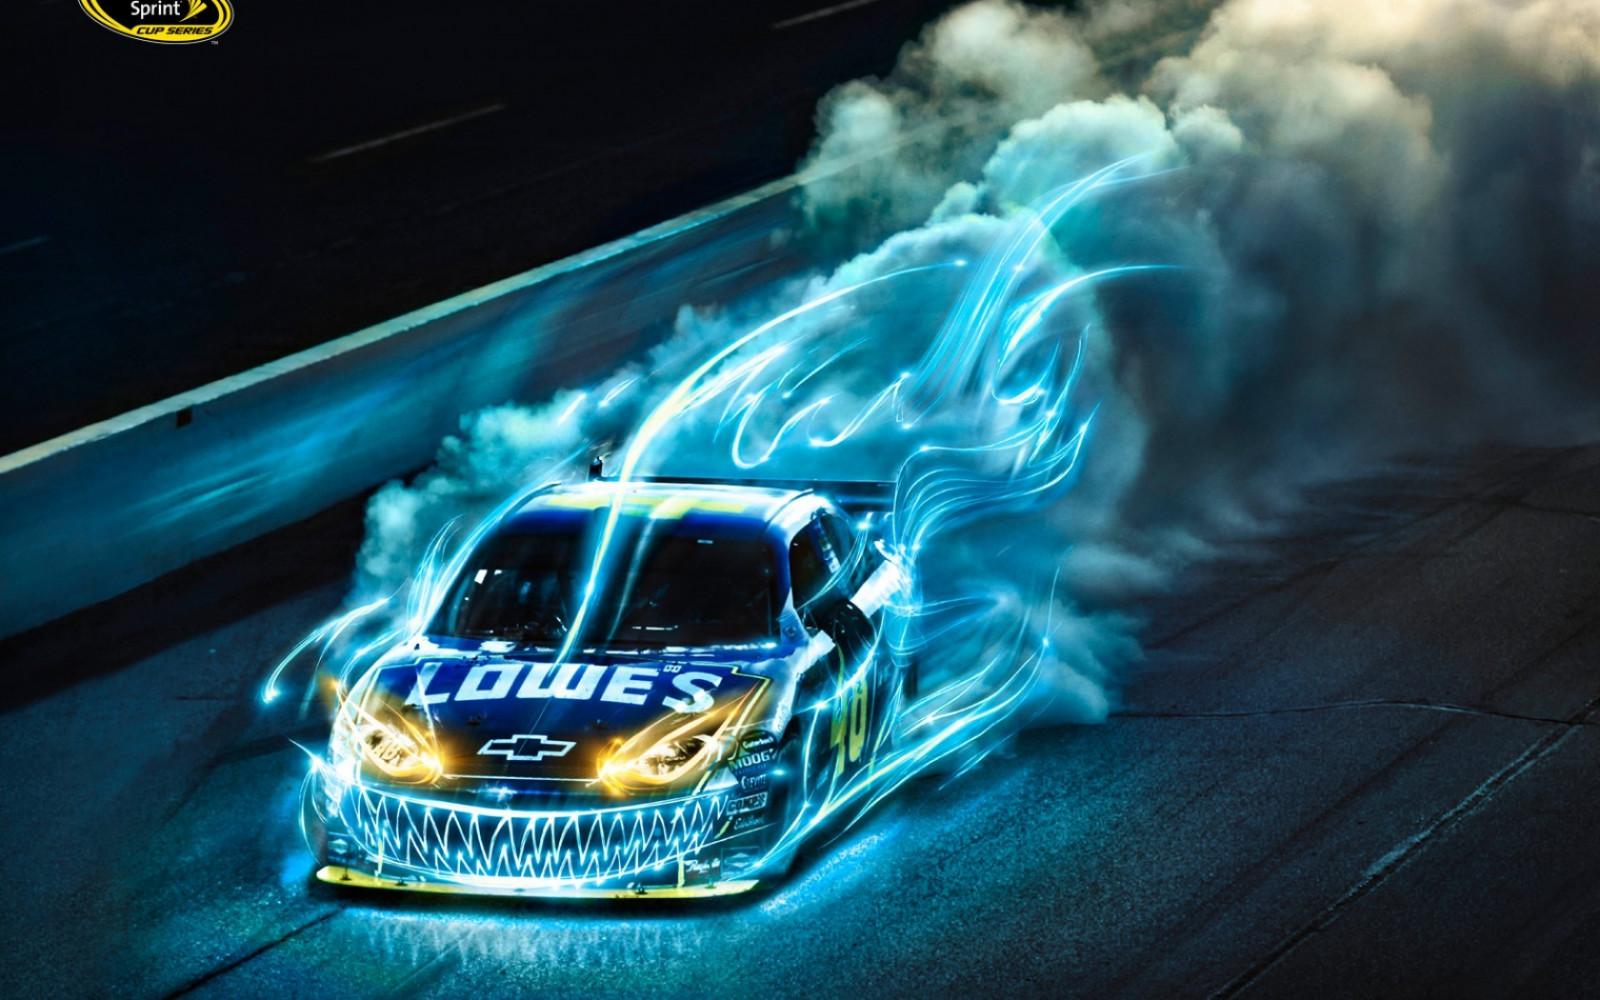 Wallpaper : Kendaraan, Mobil Sport, Nascar, Cahaya